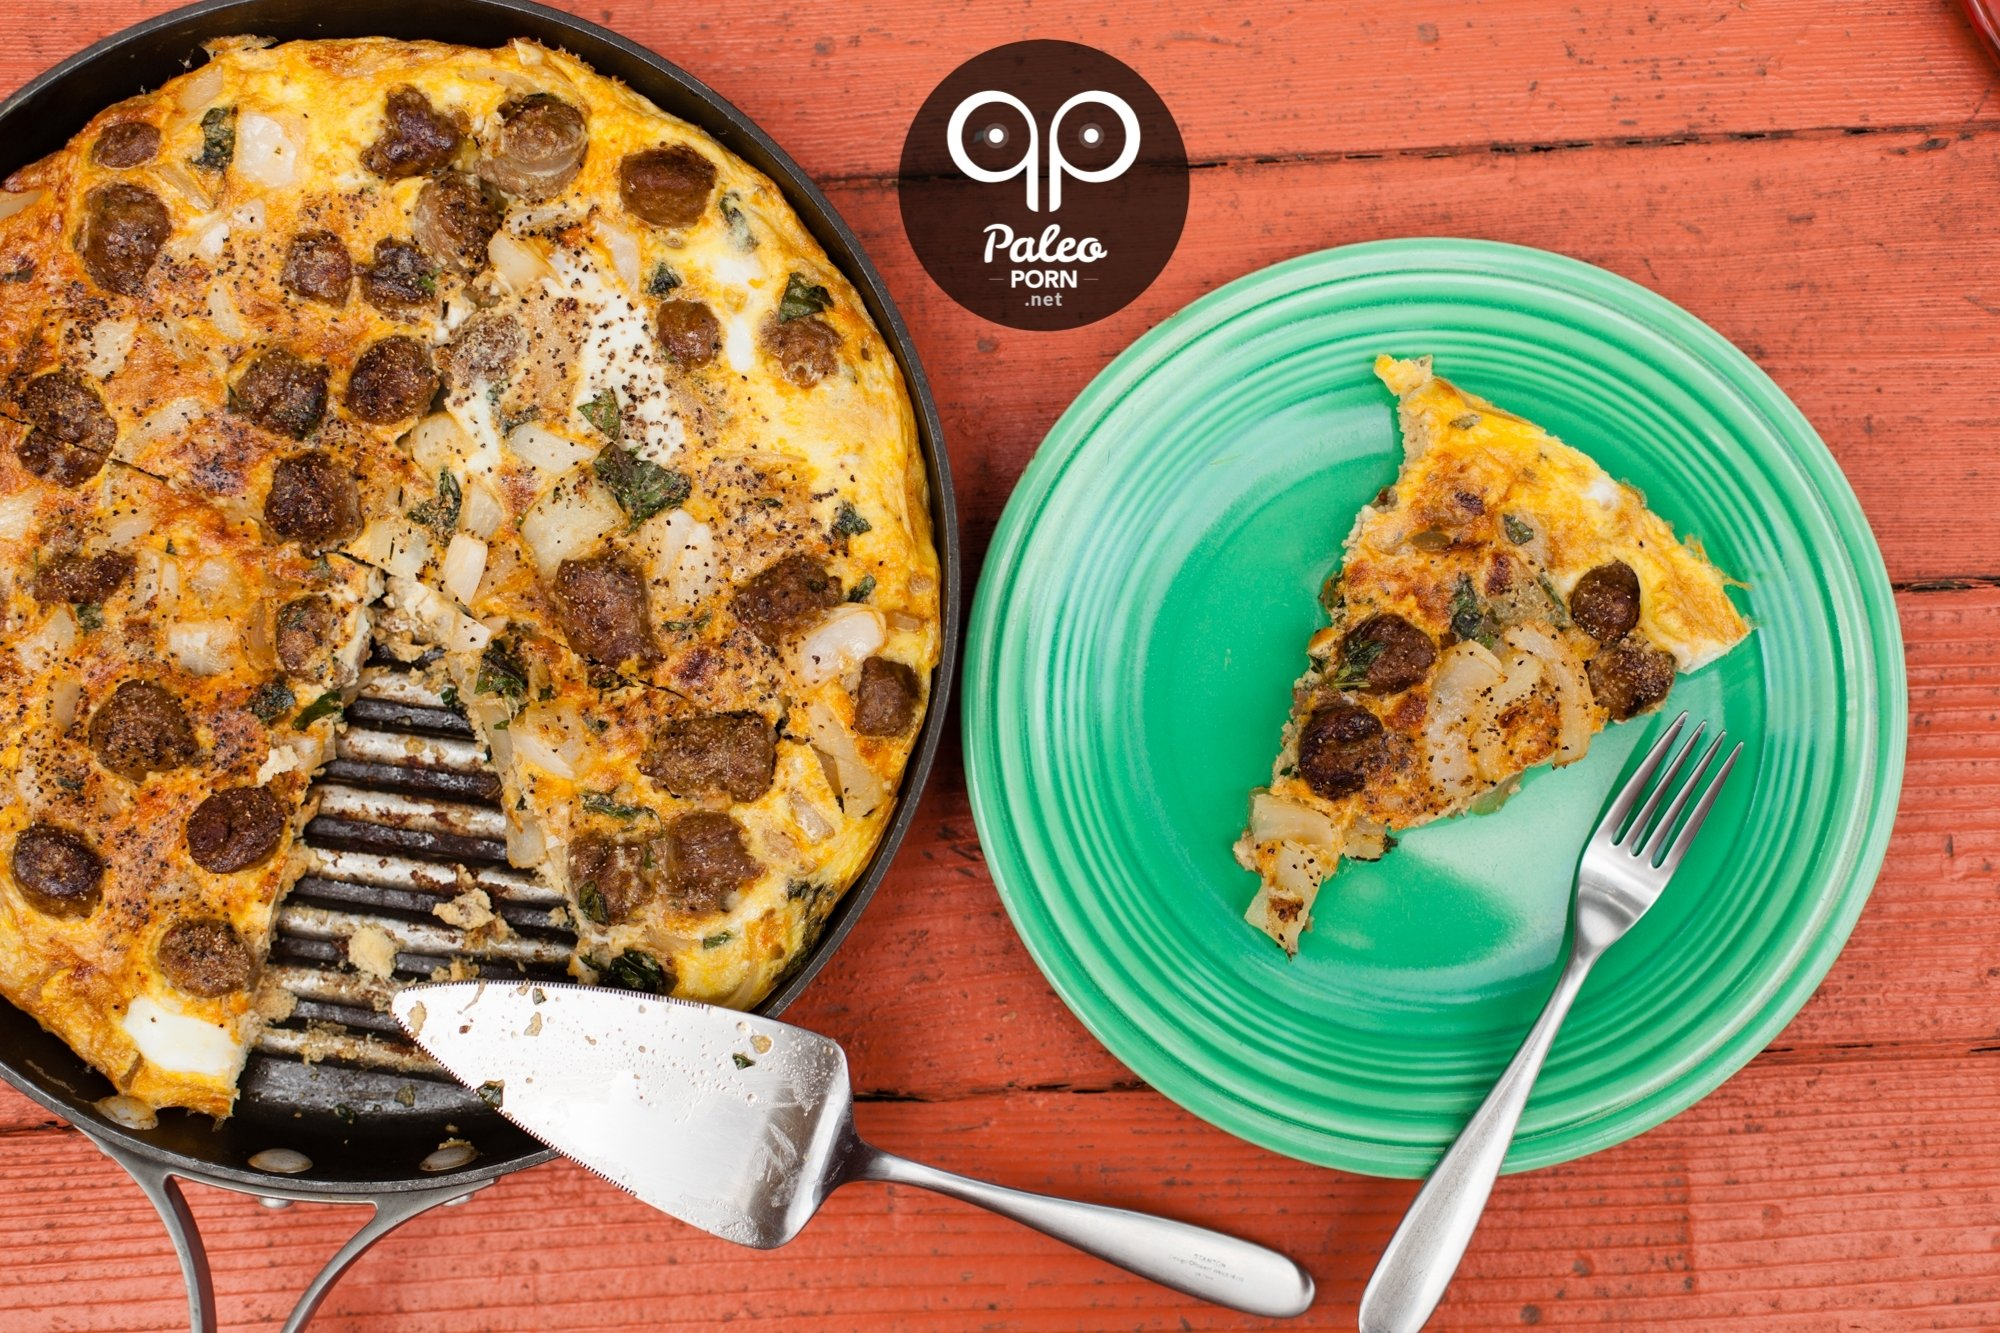 10 Stunning Paleo Breakfast Ideas On The Go paleo breakfast pizza with lamb chorizo paleo porn steamy paleo